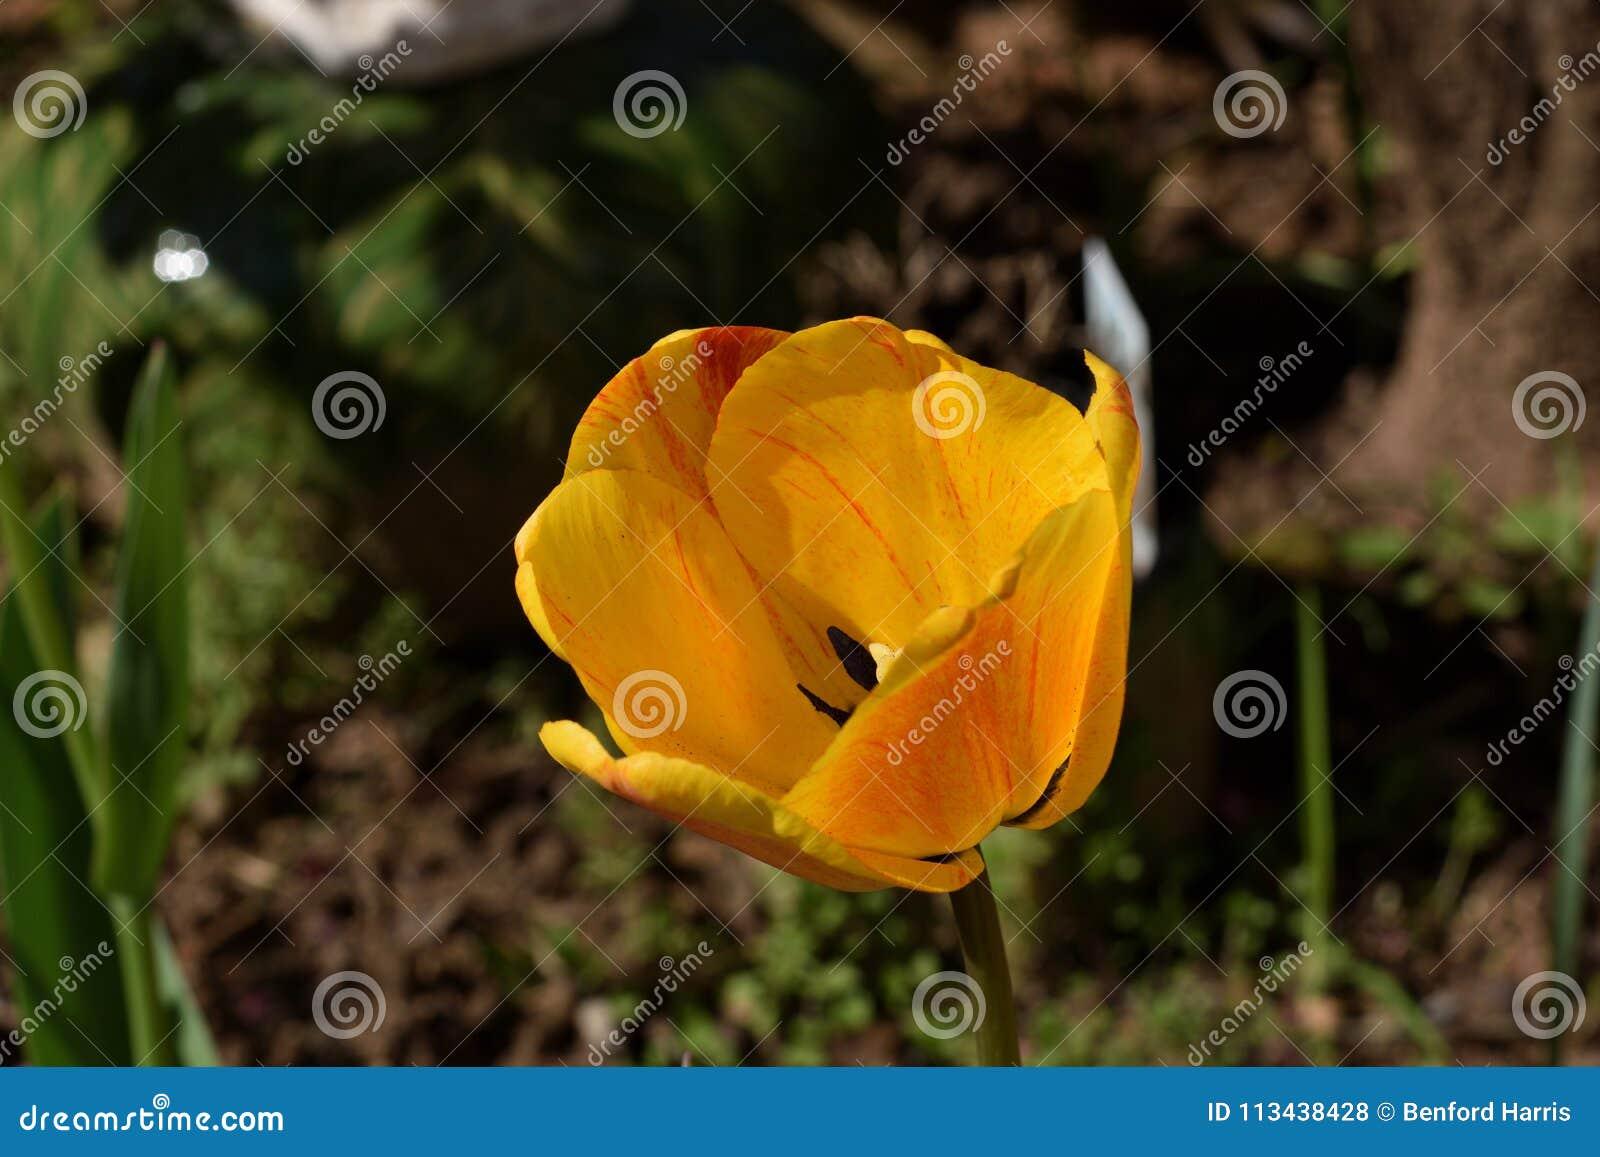 Rote gelb-orangee Tulpe ` orange Zerstampfung ` Varigated